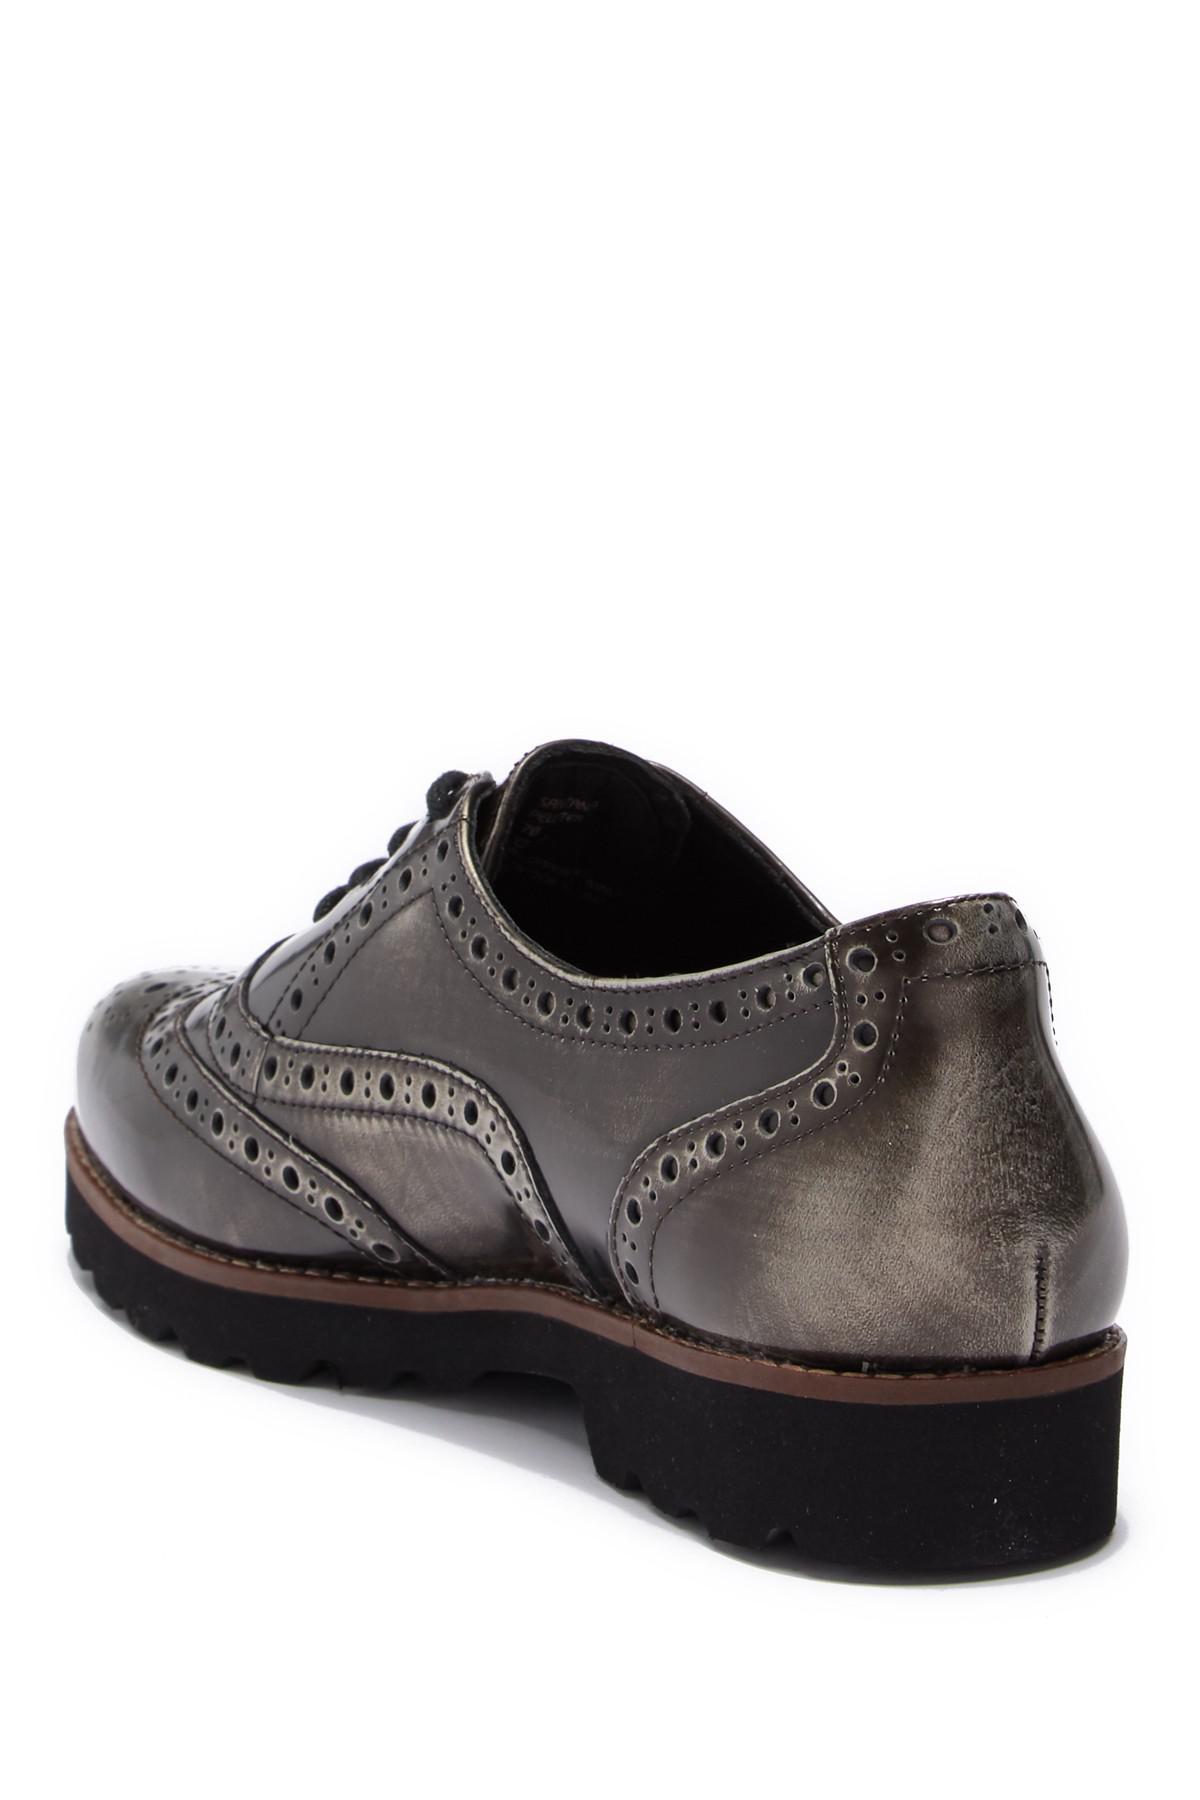 32c914f79b9 Earthies - Black Santana Wingtip Leather Oxford - Lyst. View fullscreen